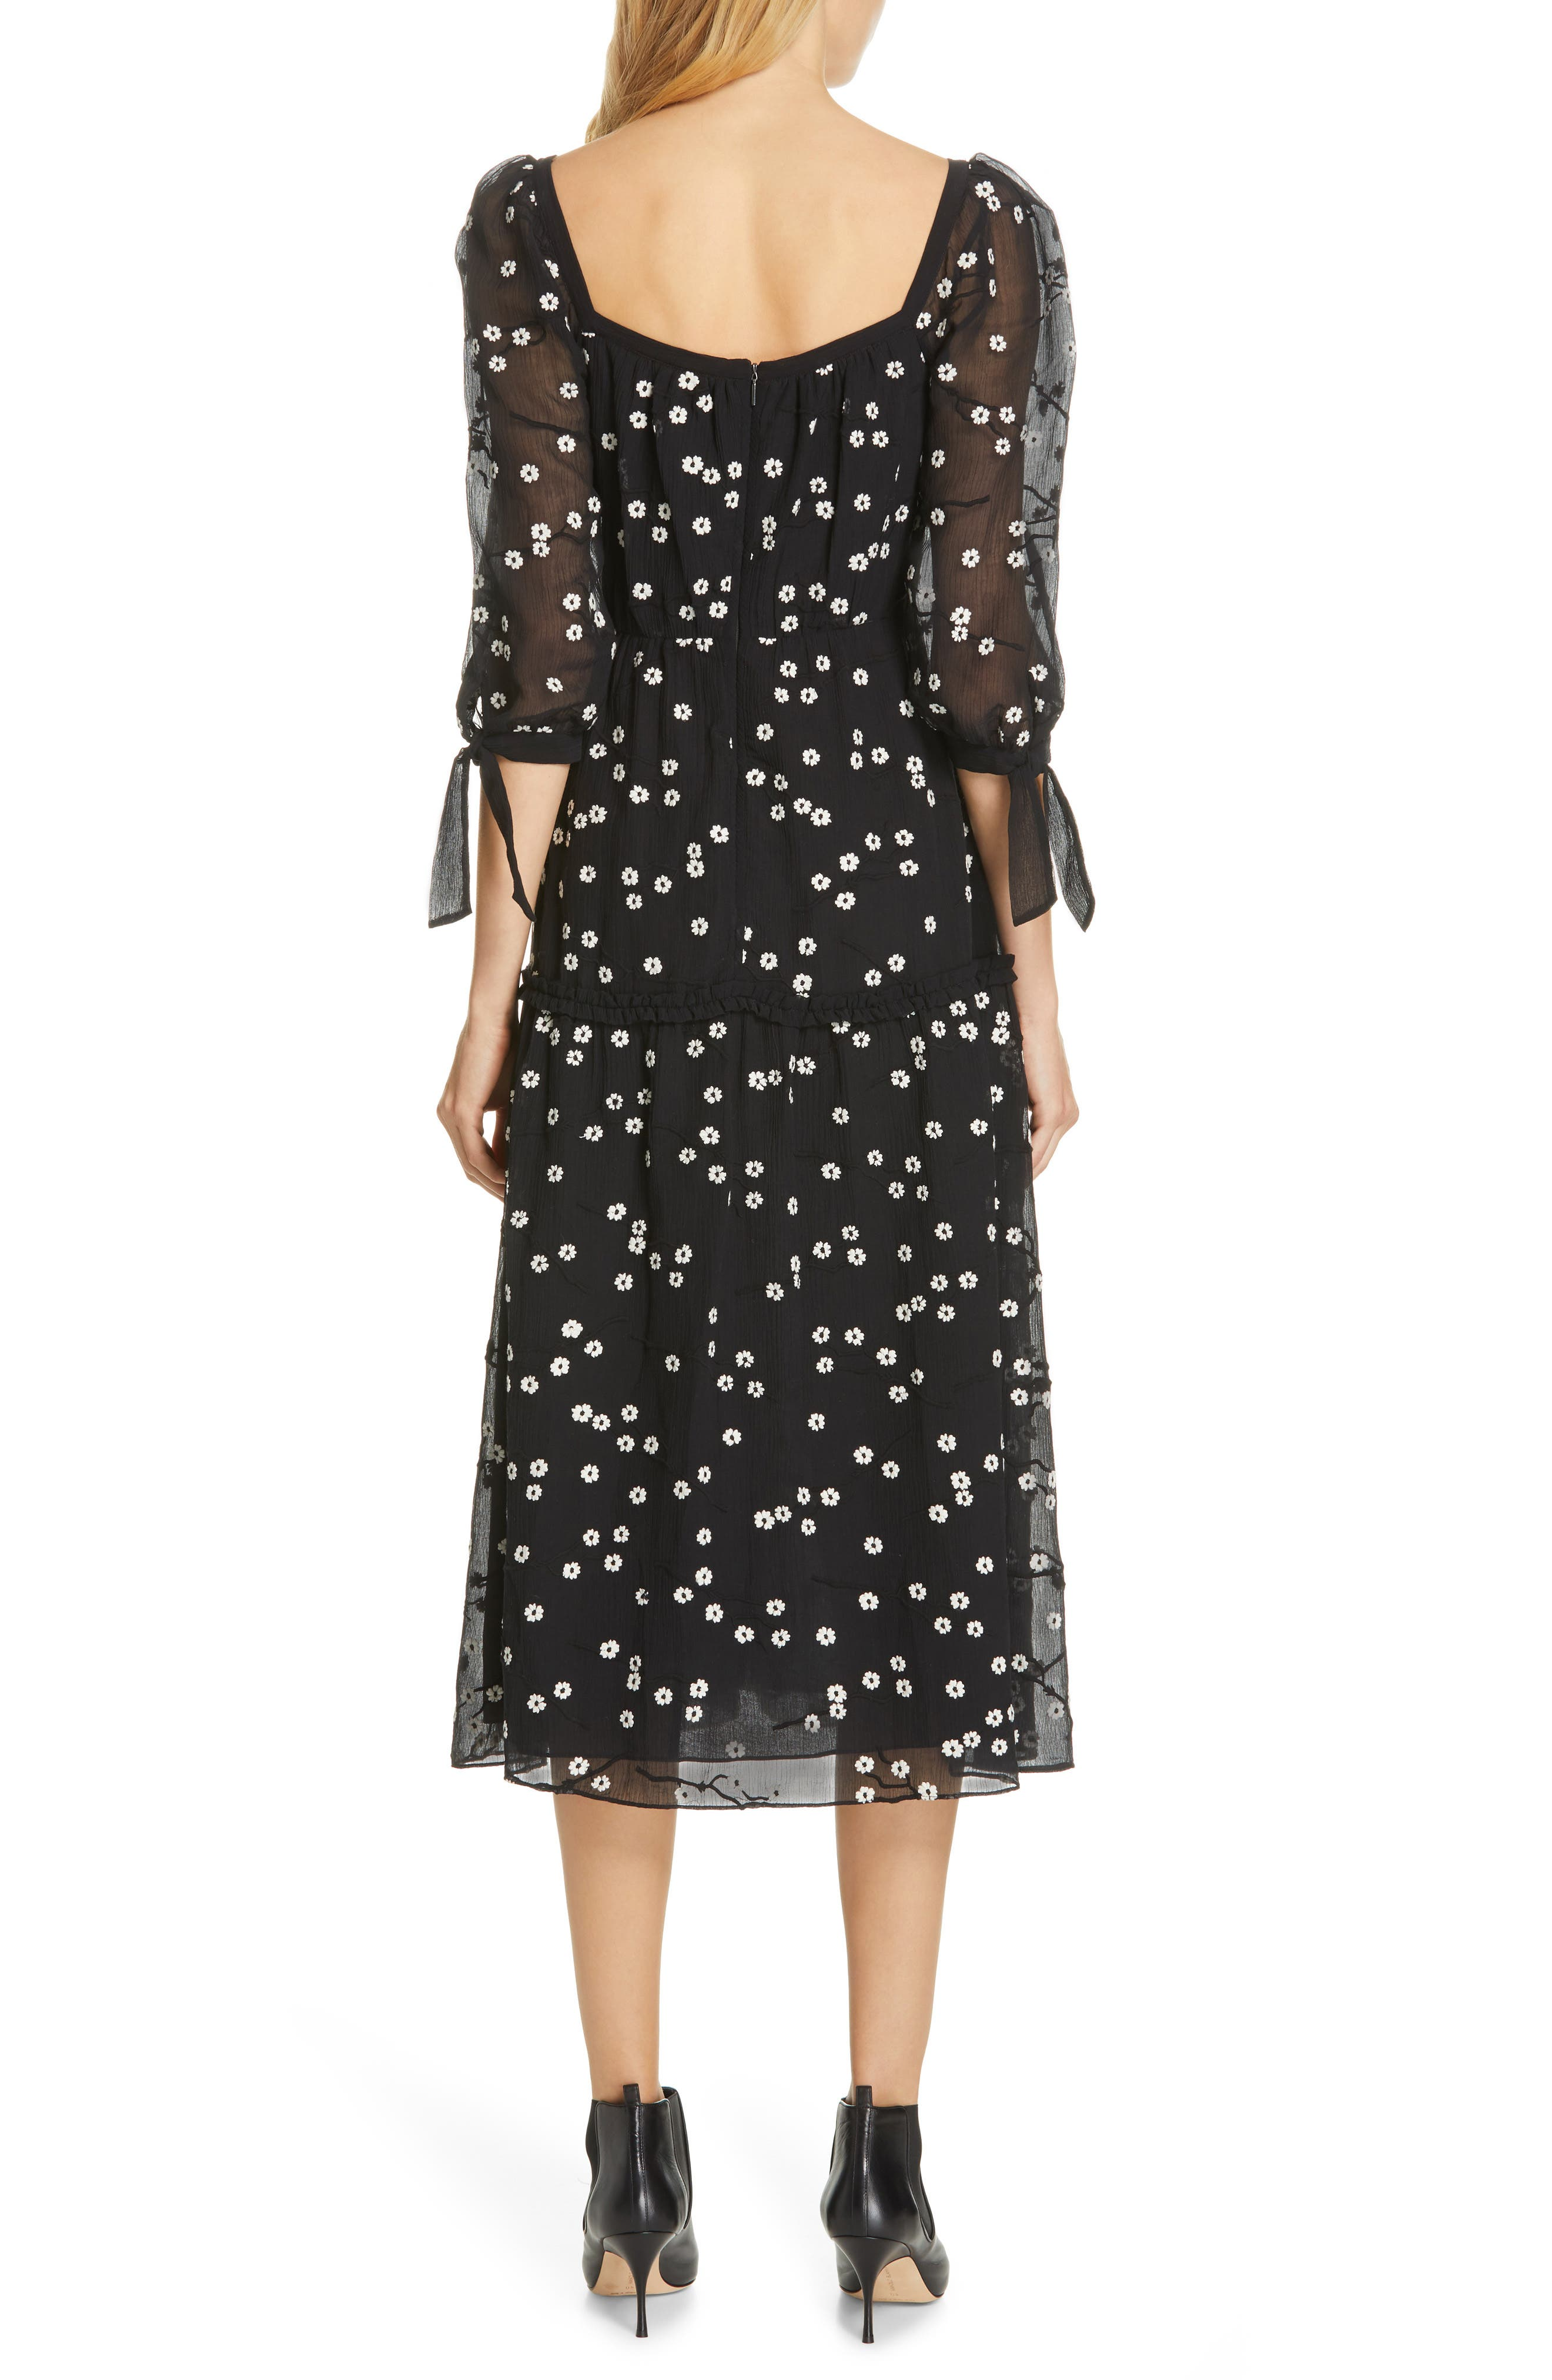 REBECCA TAYLOR, Allessandra Midi Dress, Alternate thumbnail 2, color, BLACK COMBO